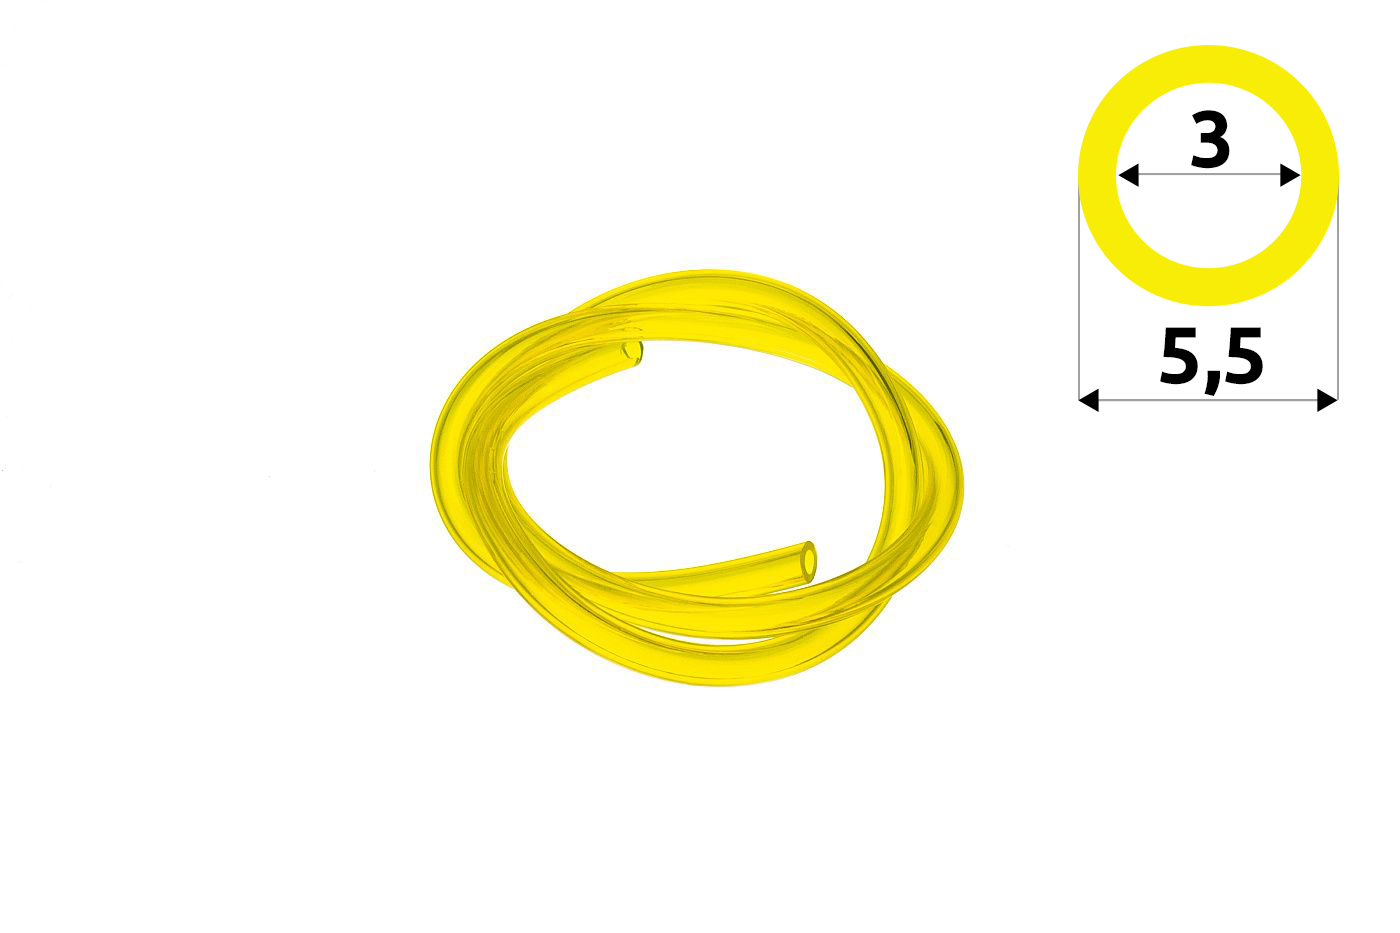 Palivová hadička 3 mm x 5,5 mm - 1 meter